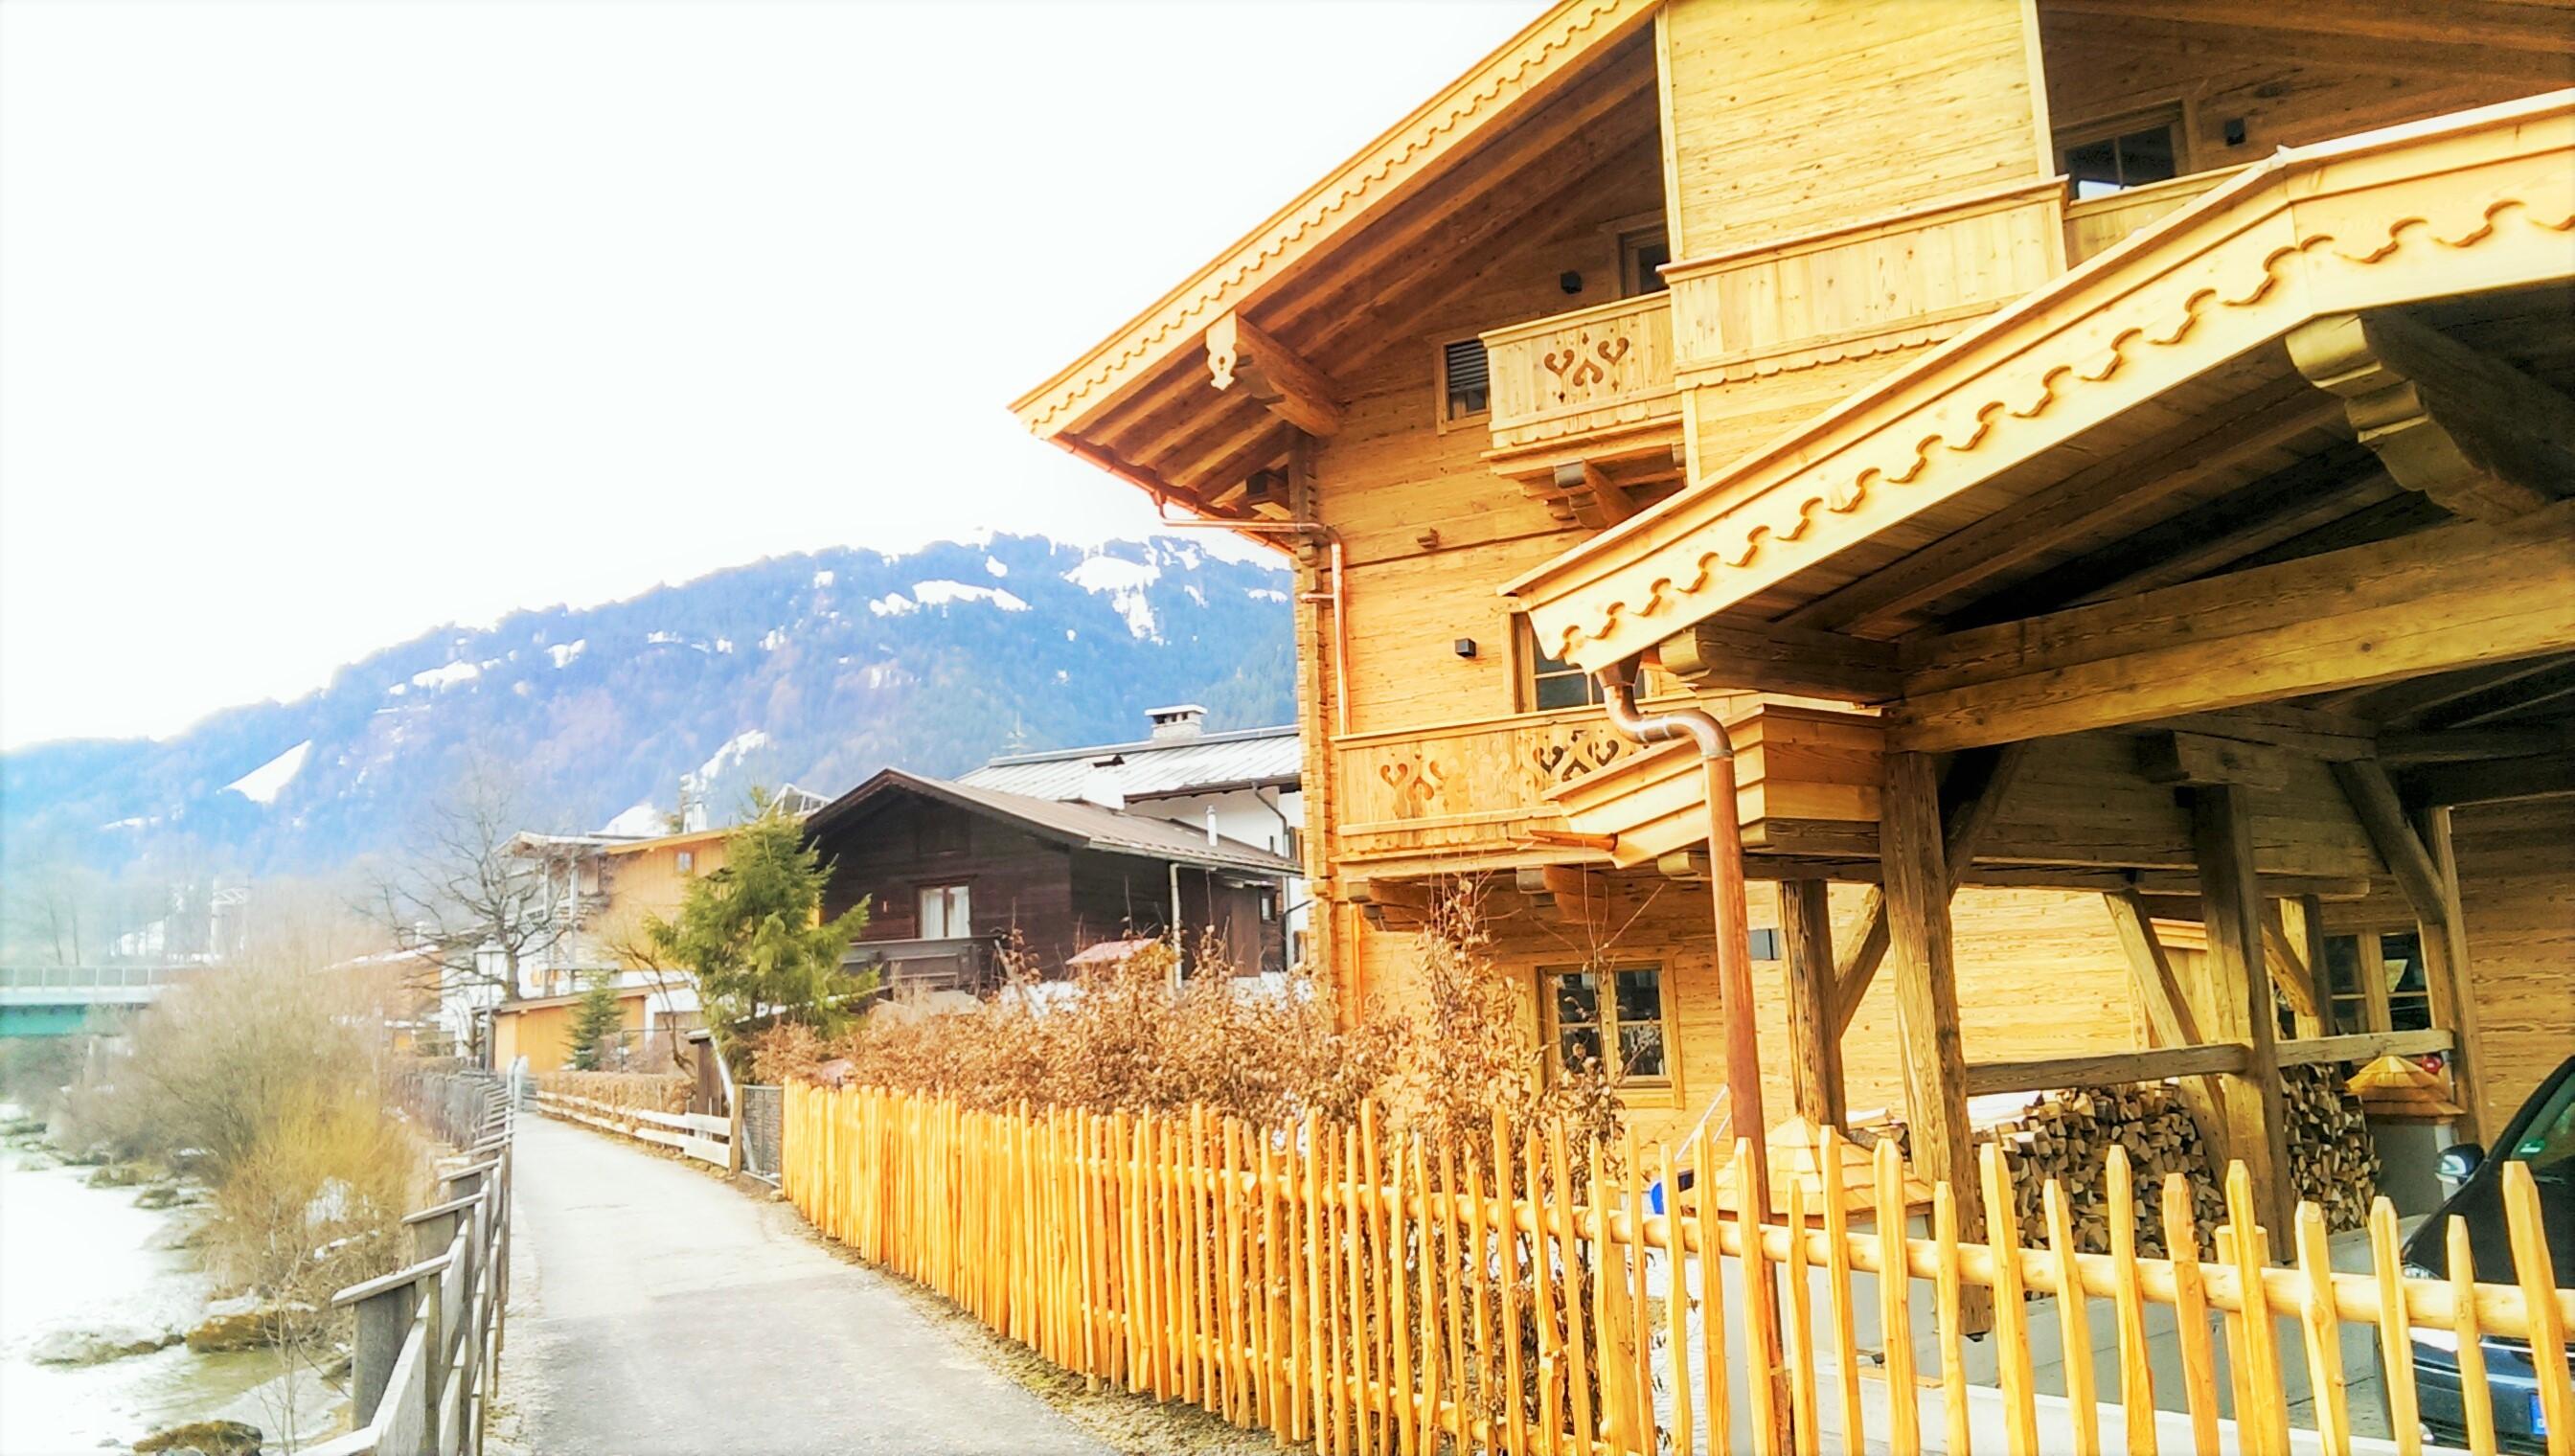 Carry It Like Harry - Kitzbühel: The Monaco of Ski Resorts